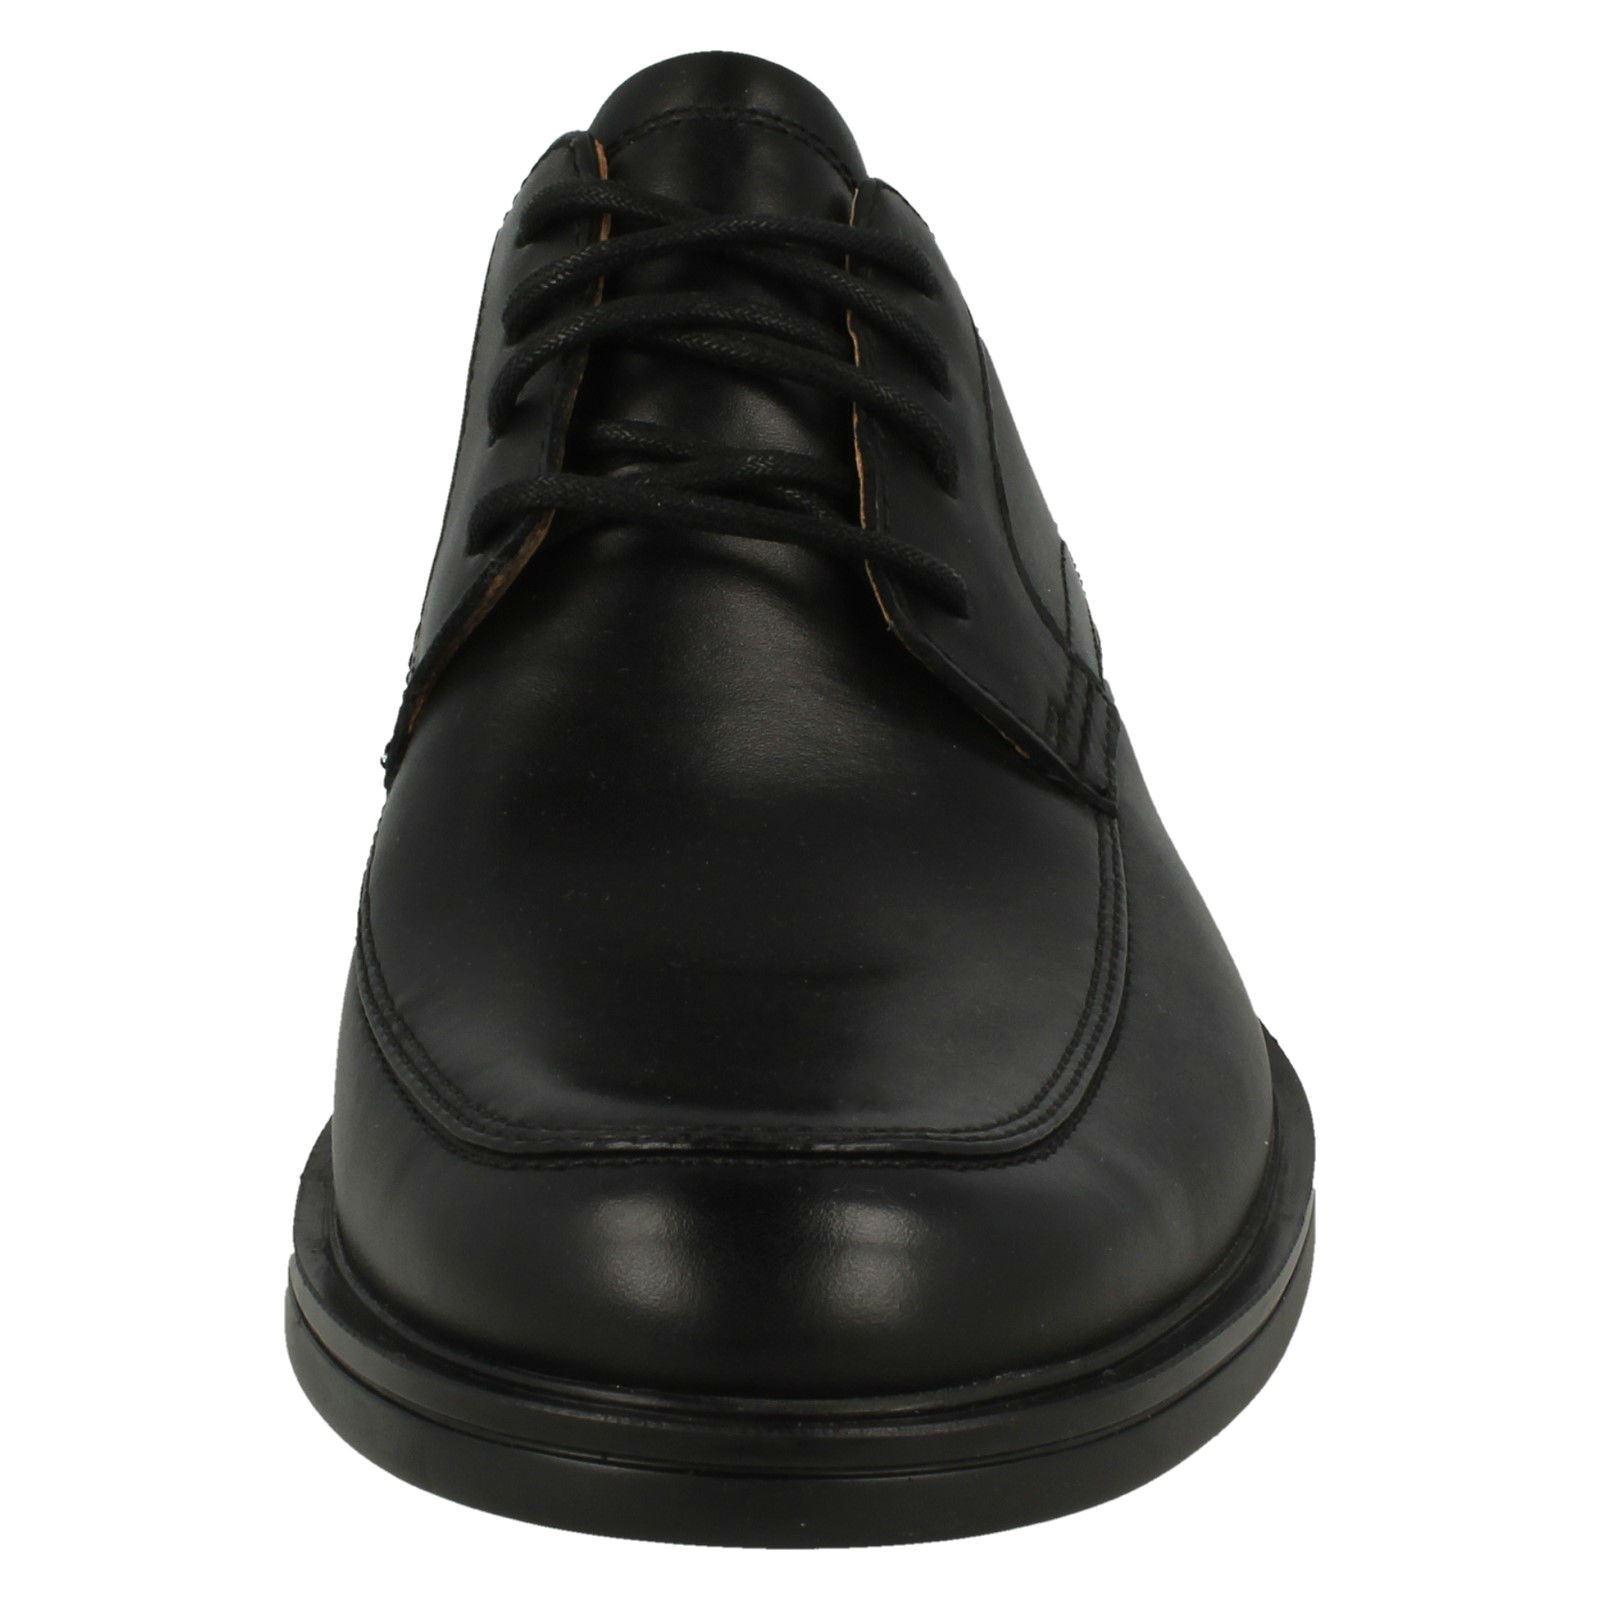 Para Park Hombre Clarks Inteligente Zapatos Con Cordones Un Aldric Park Para a27833